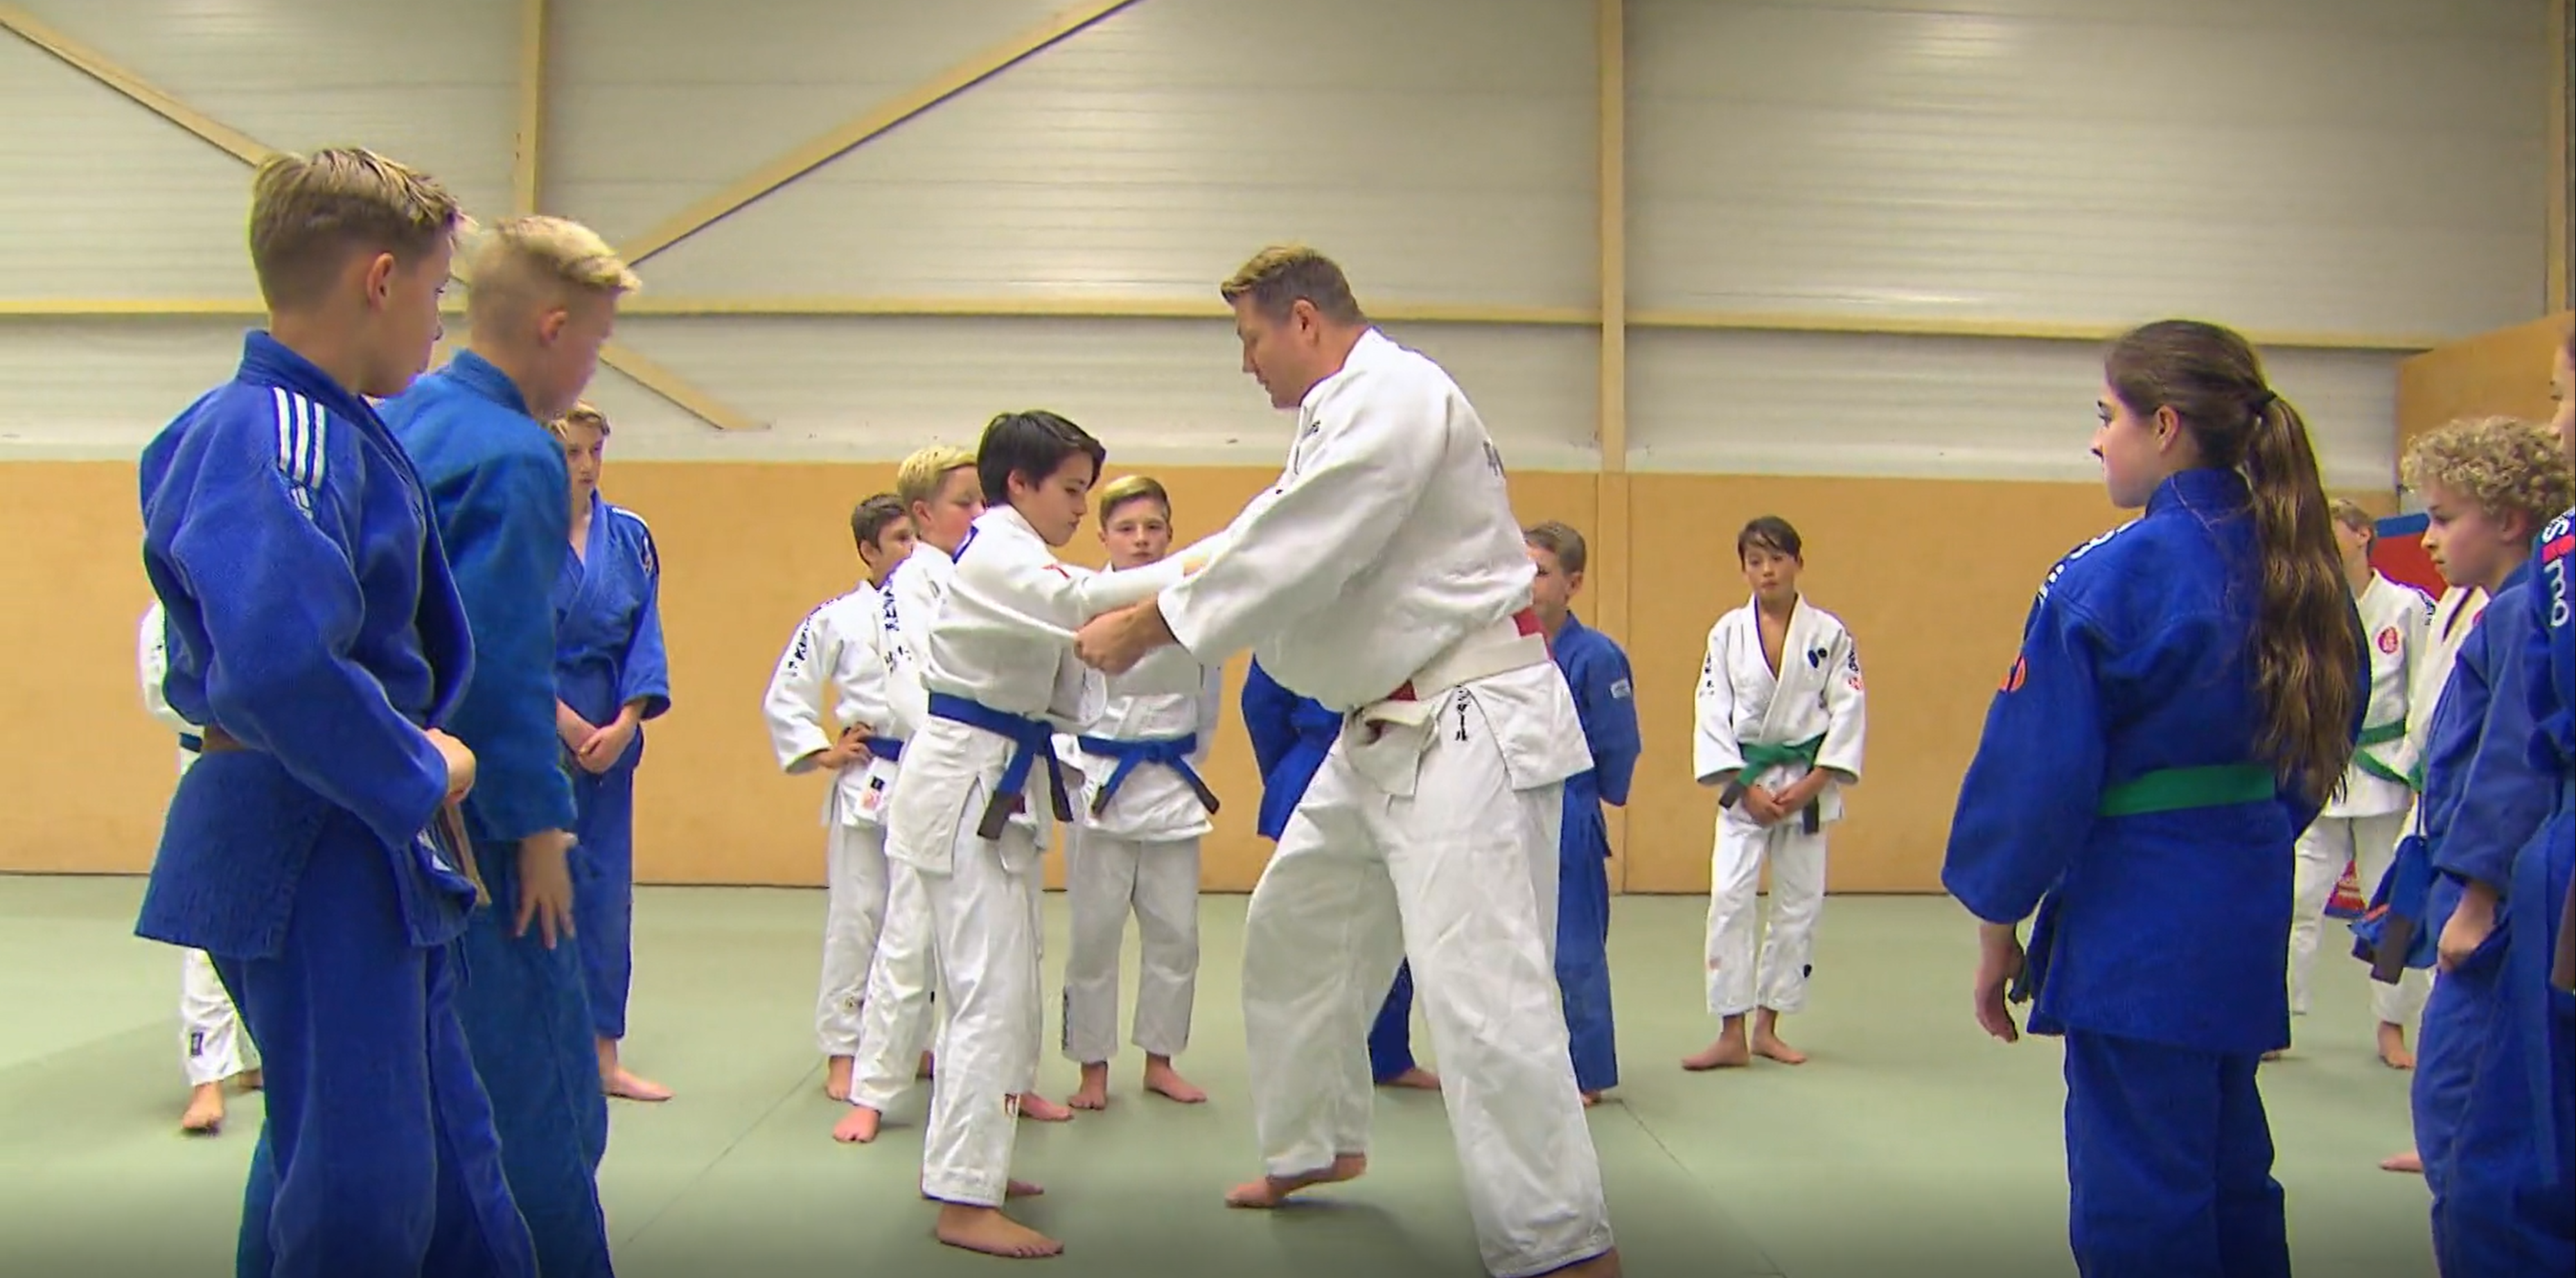 Dennis van der Geest judotraining Jeugdfonds